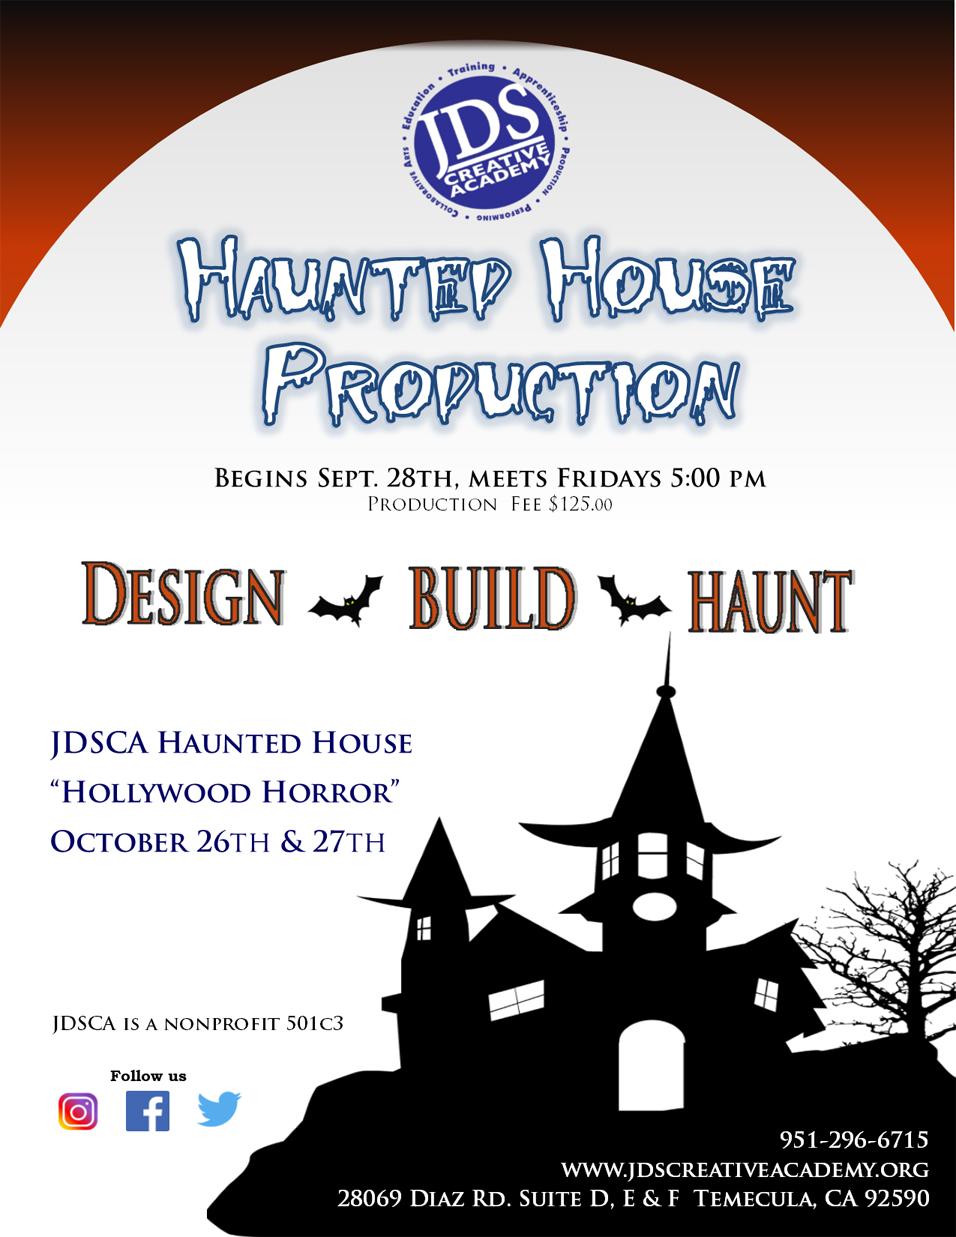 JDSCA 2018 Haunted House